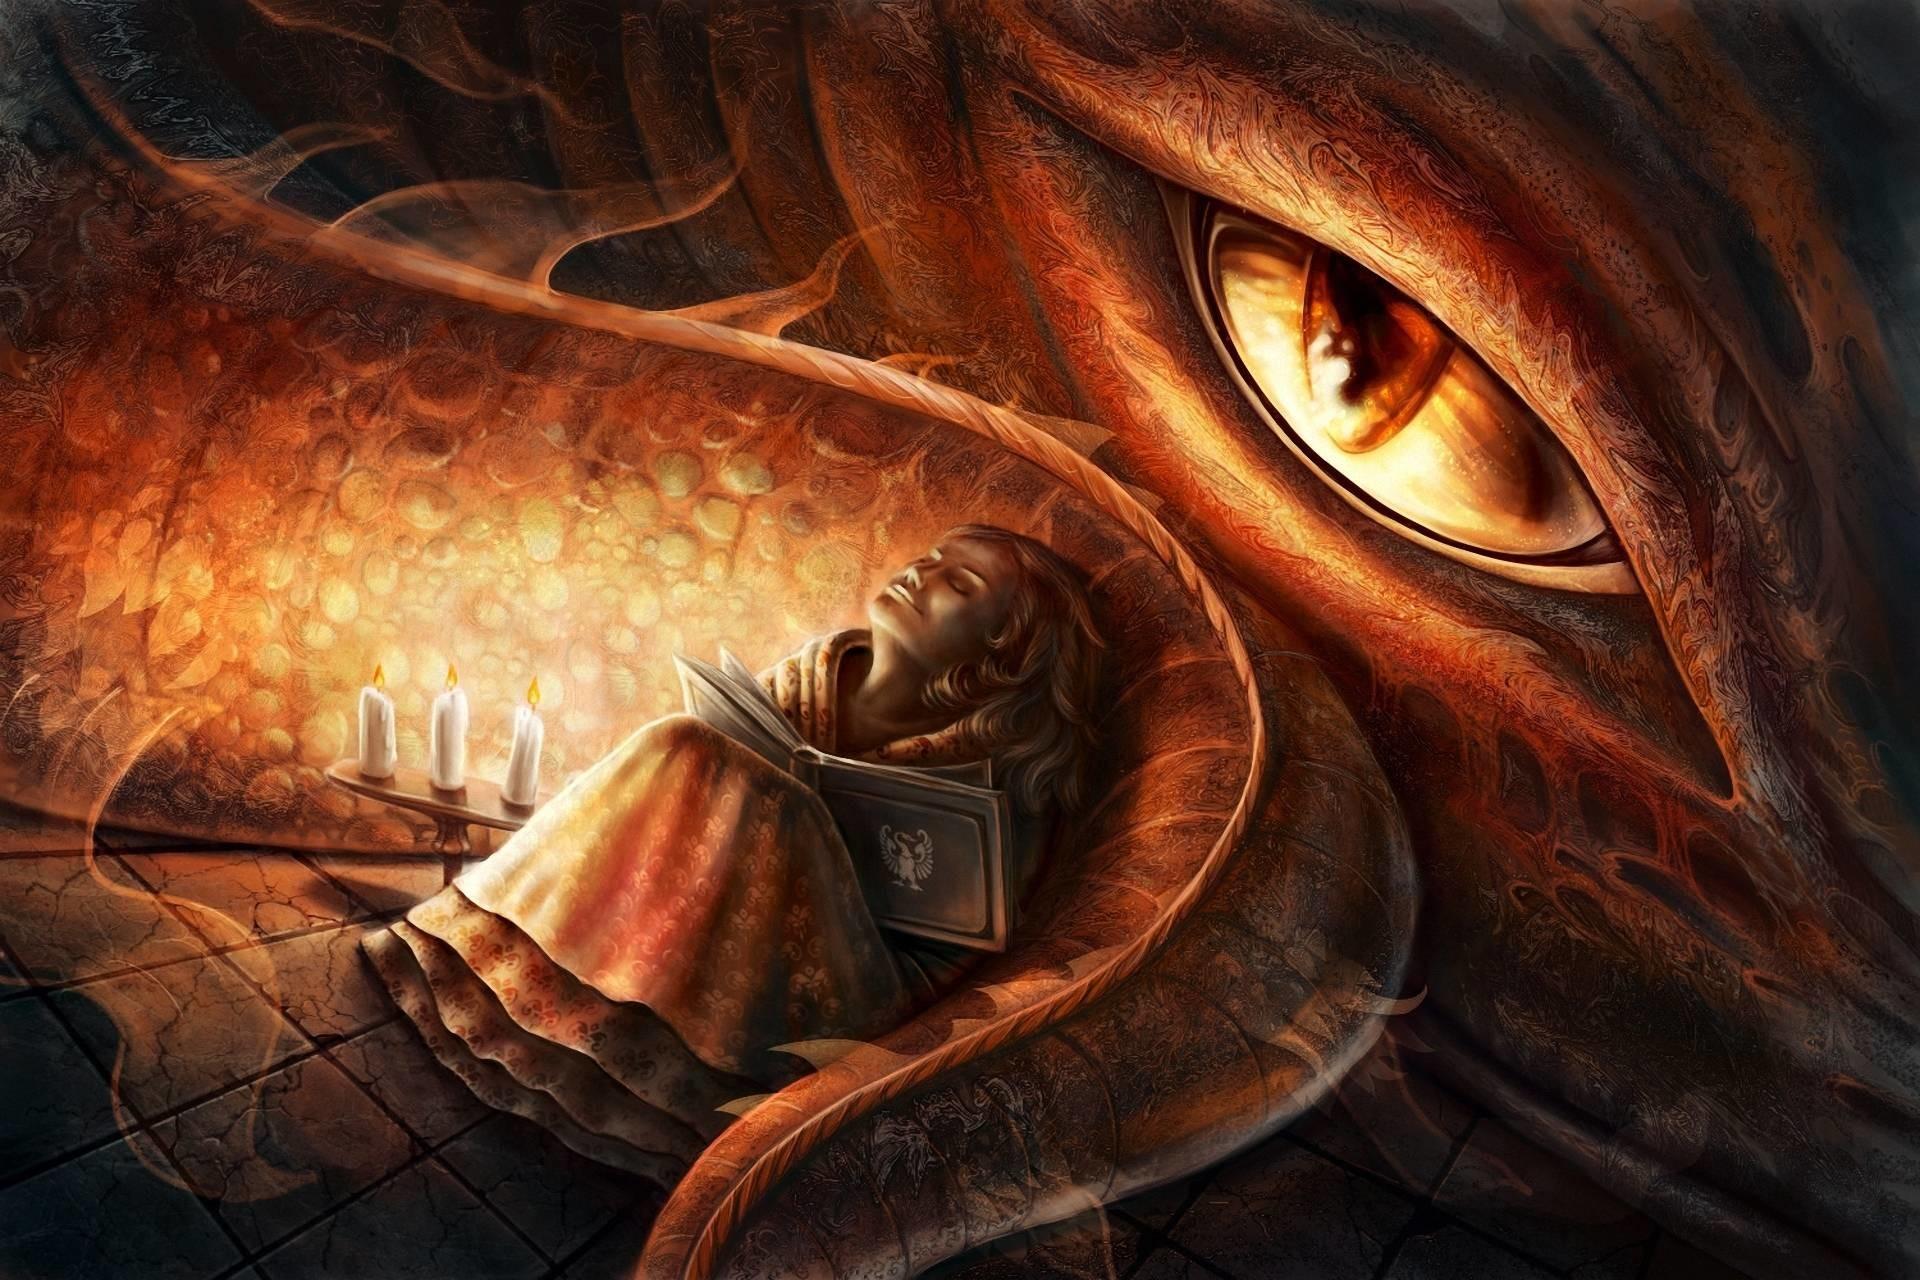 Dragon Iphone Wallpaper Hd 71 Images